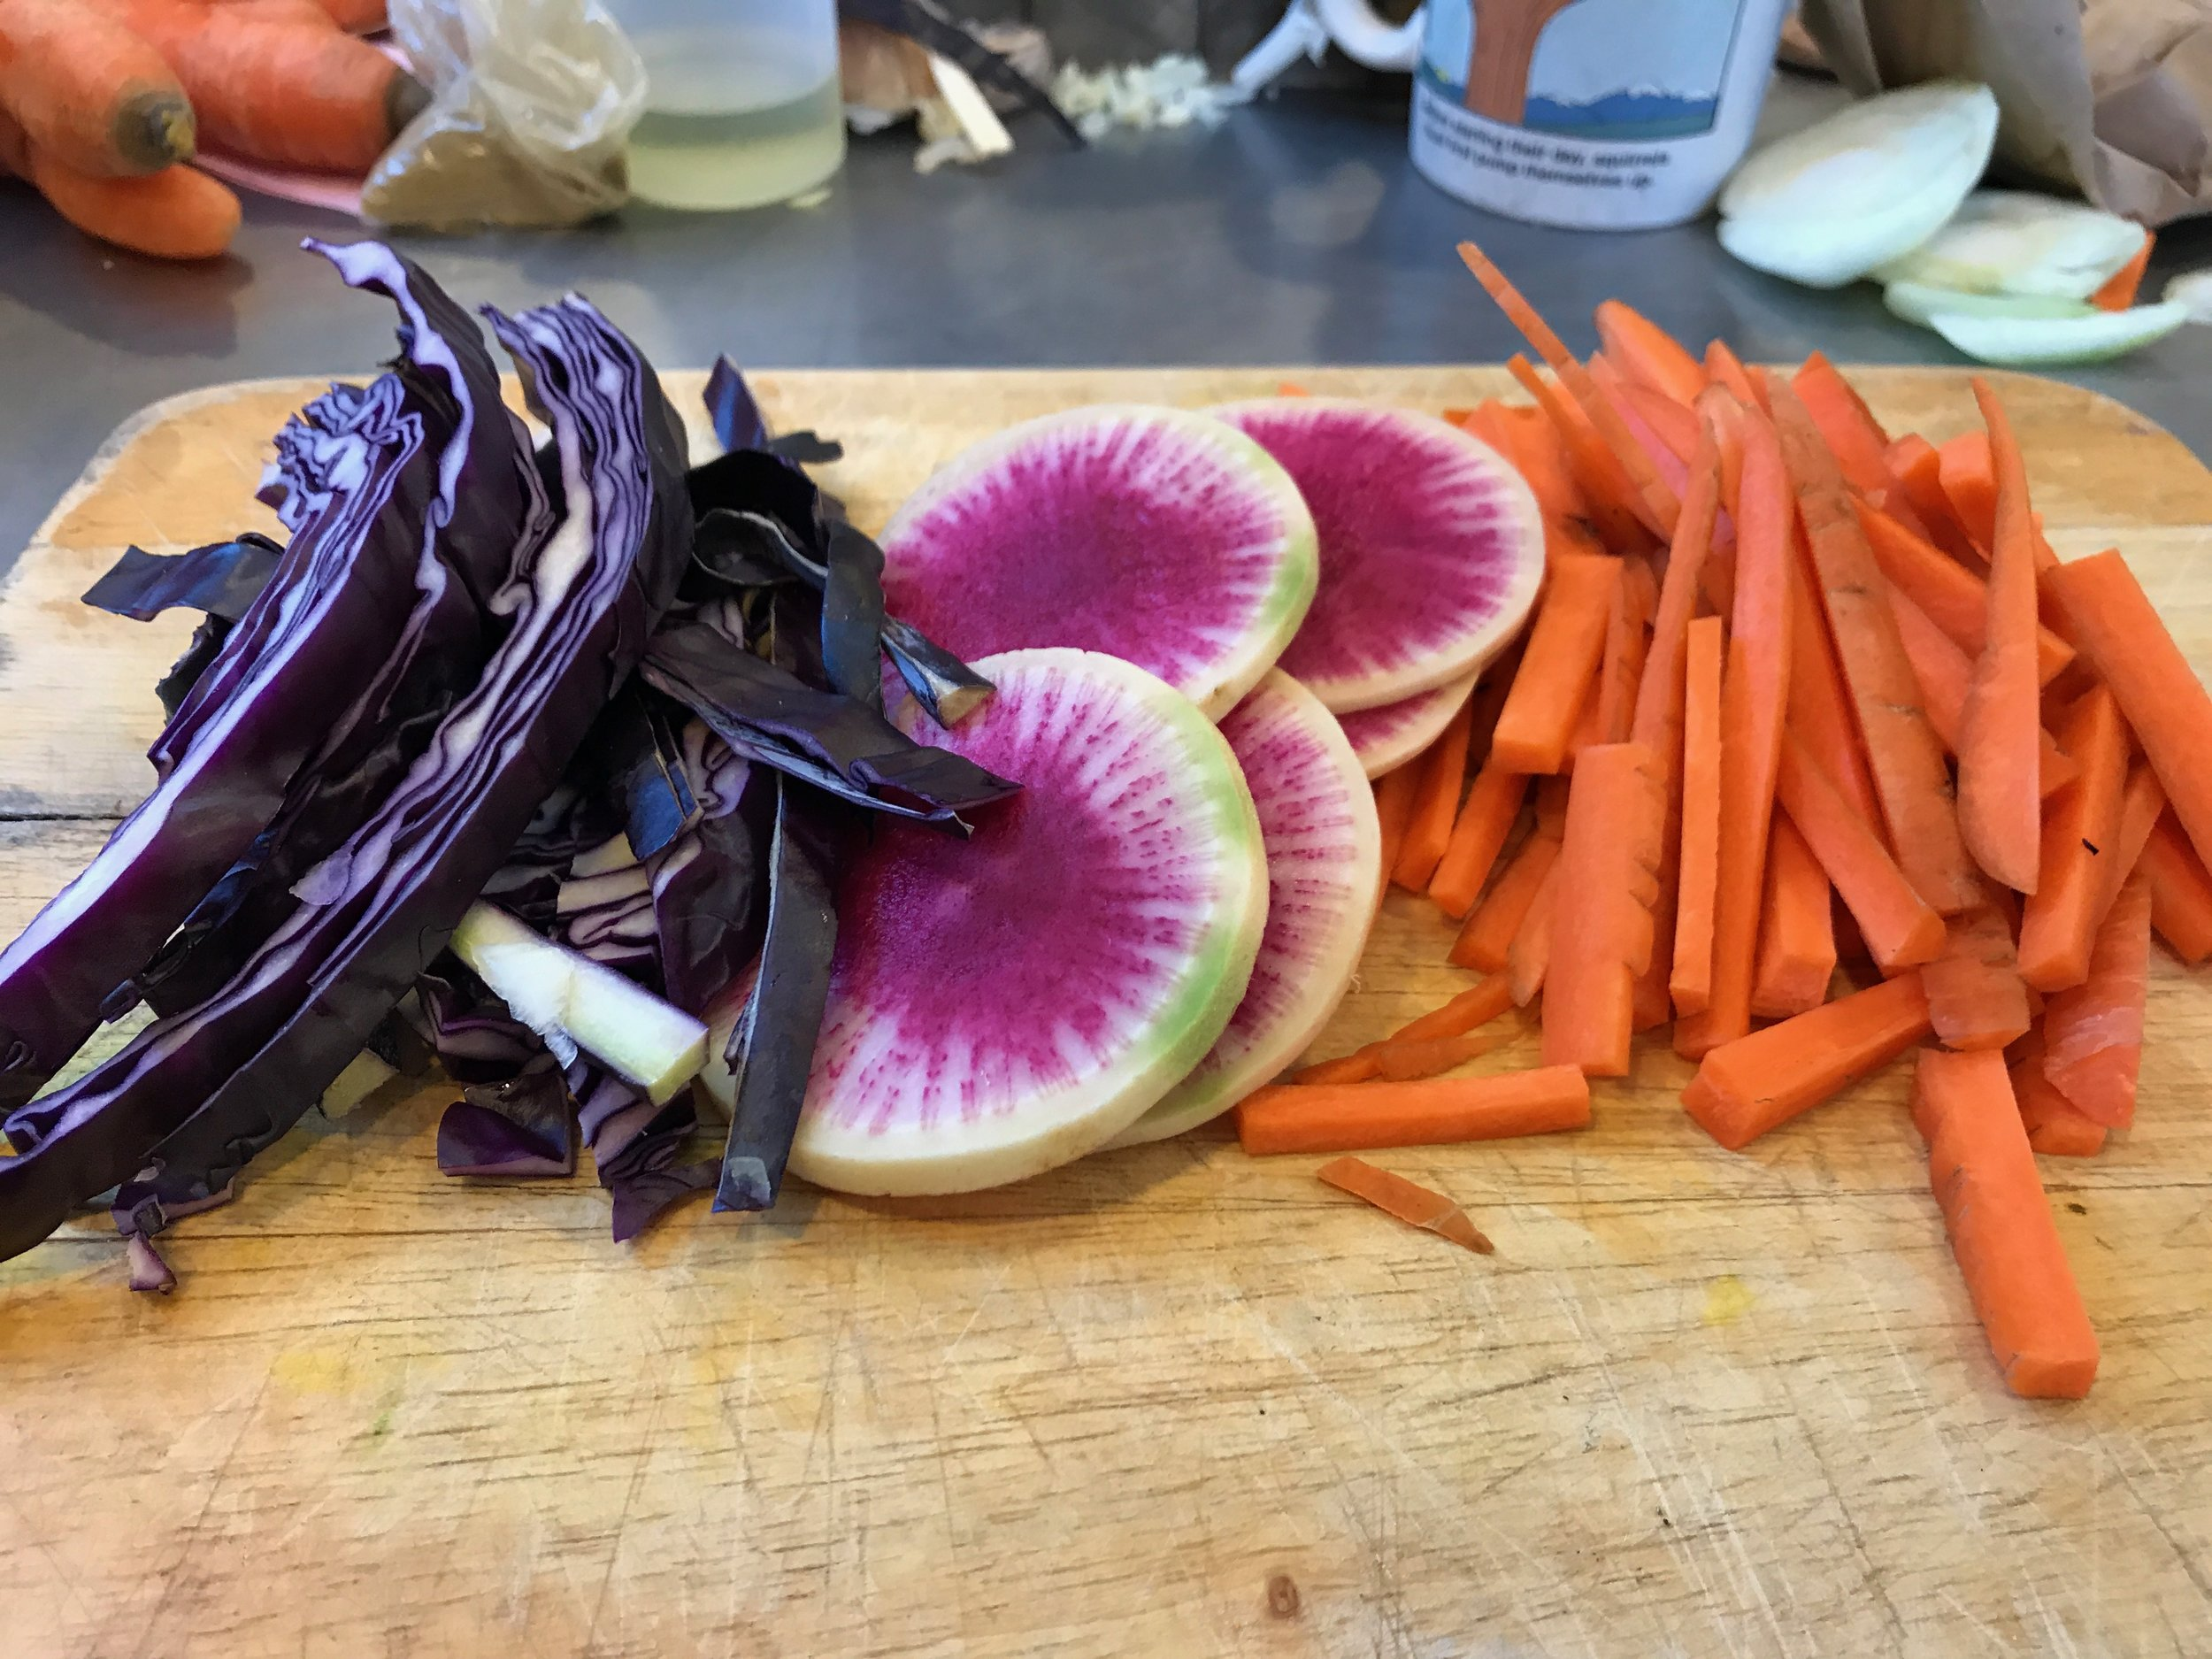 carrot and watermelon radish salad